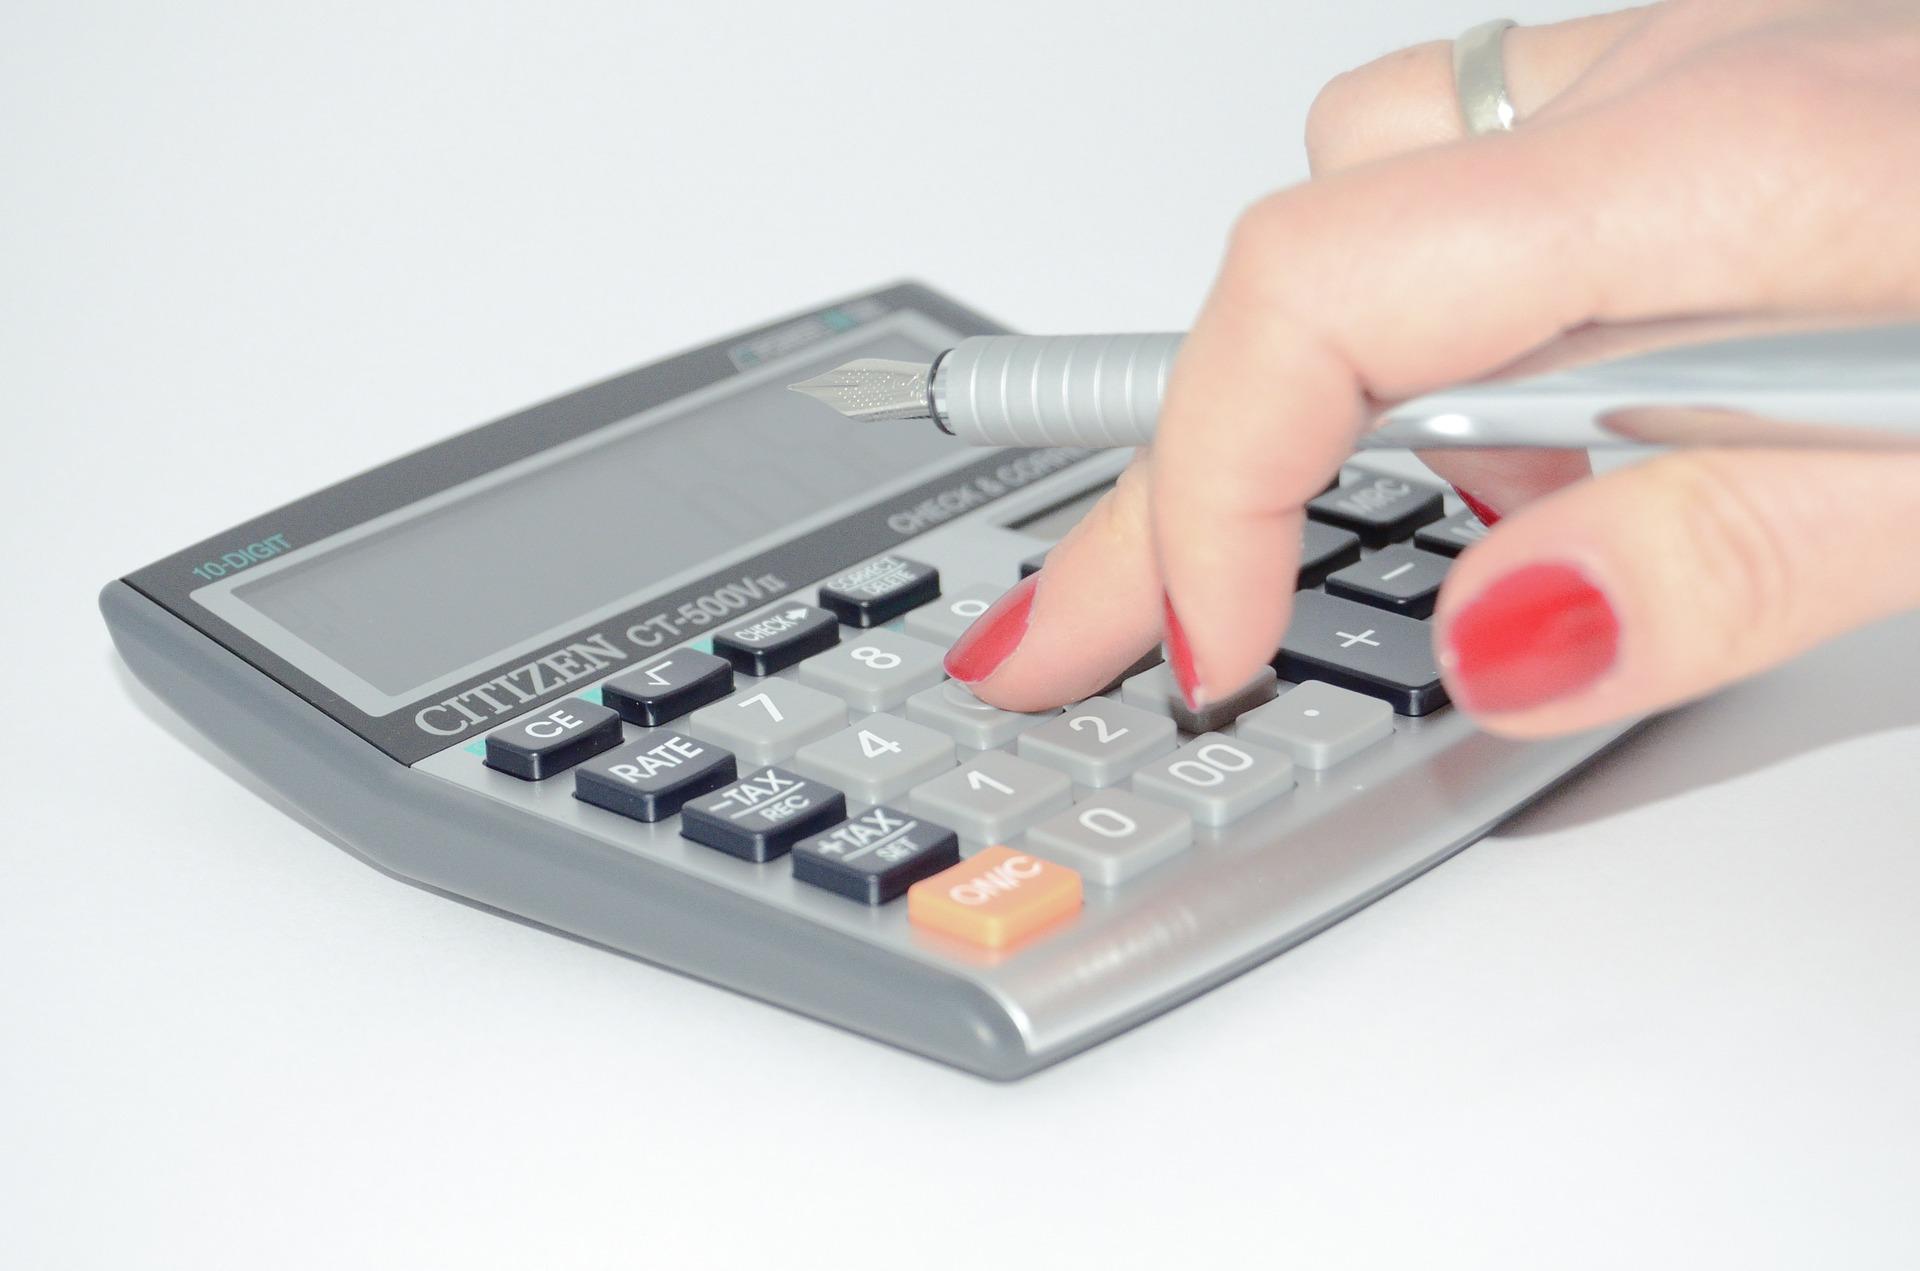 calculator-428294_1920.jpg